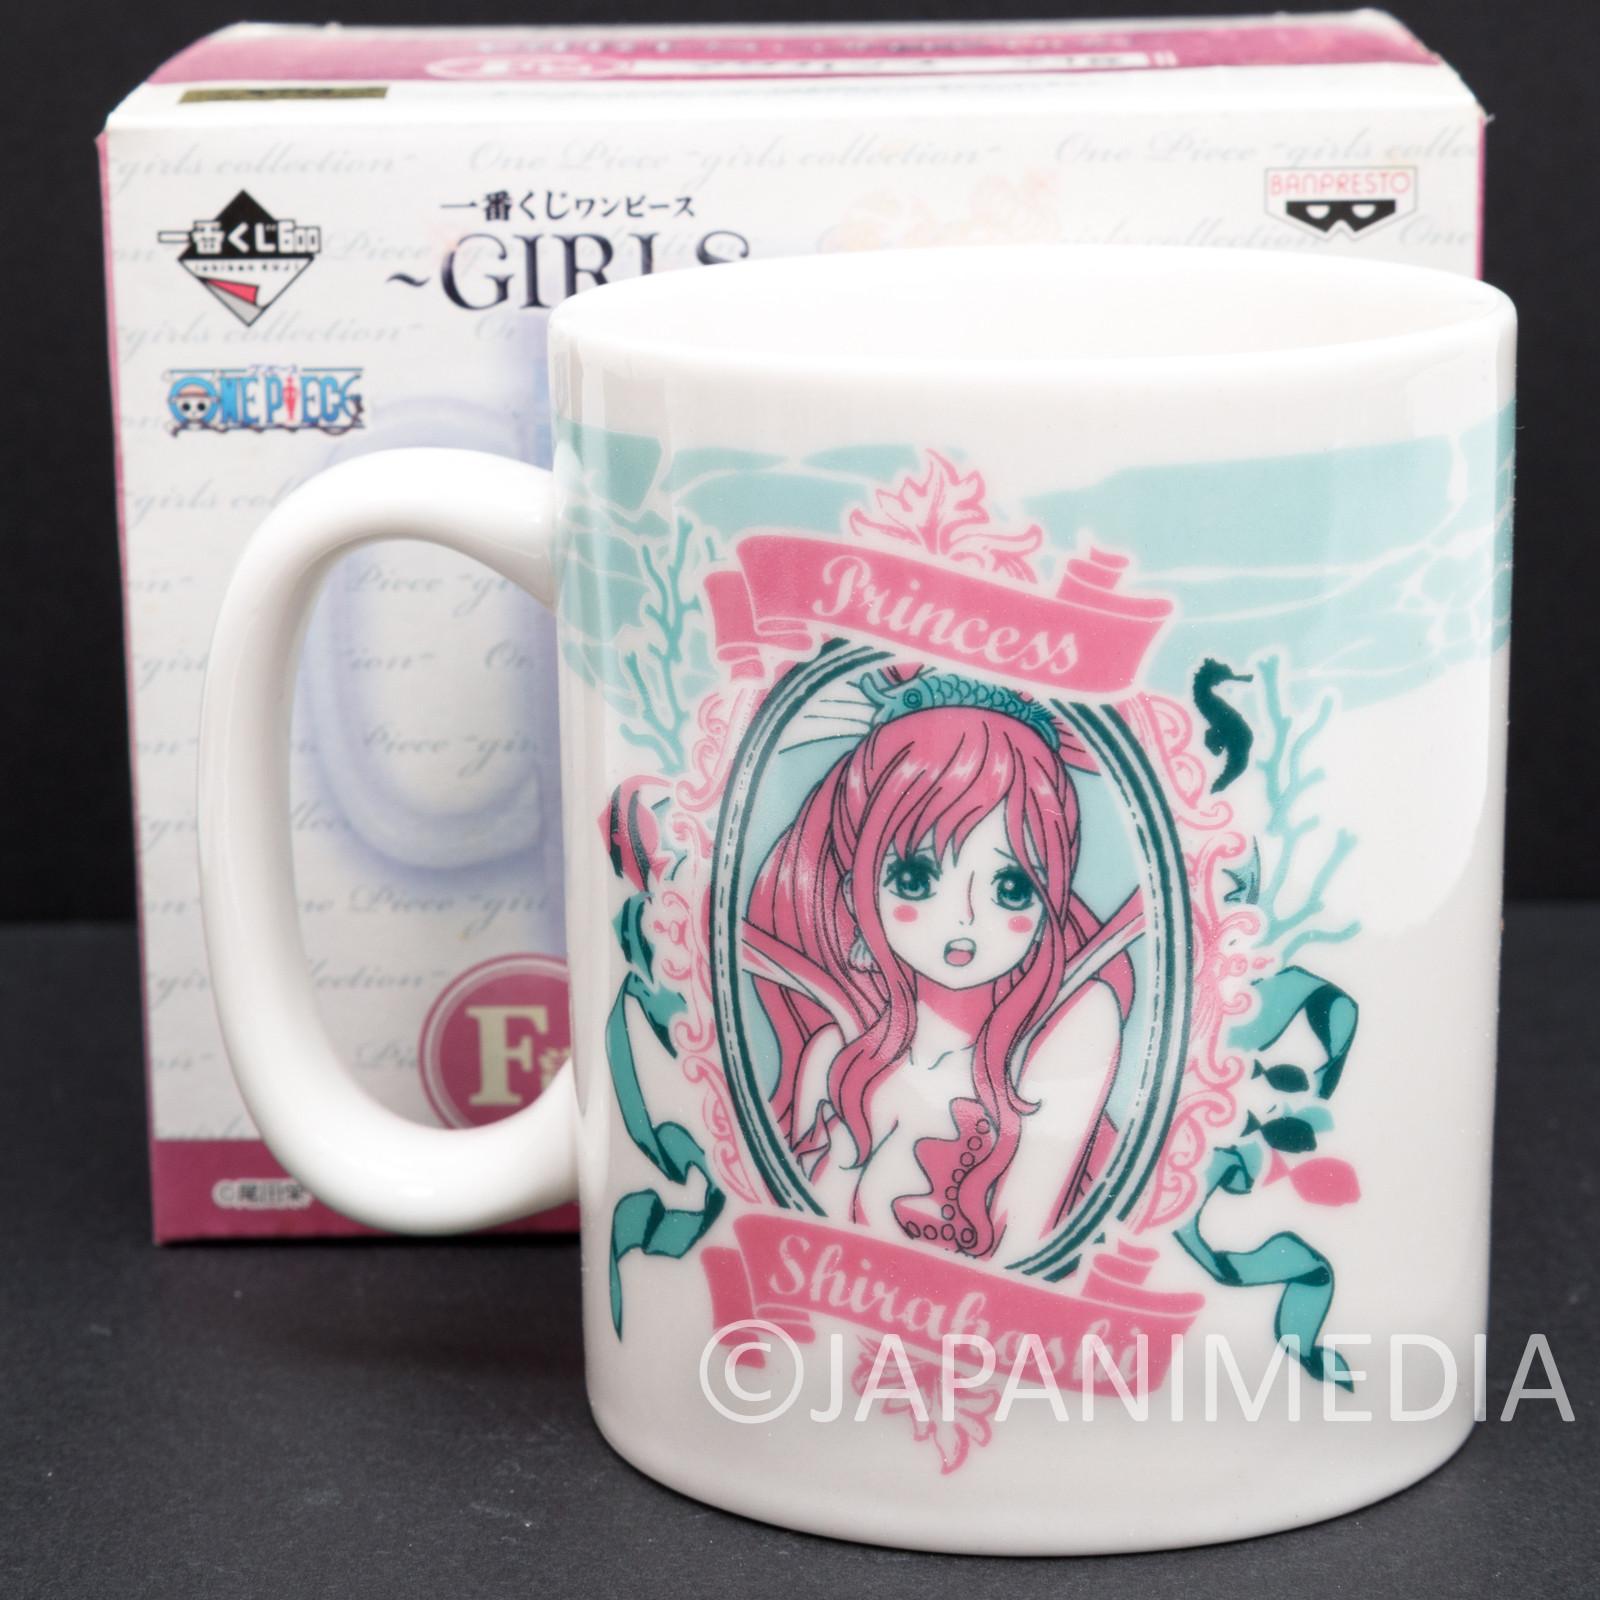 One Piece Princess Shirahoshi Mug Girls Collection Banpresto JAPAN ANIME